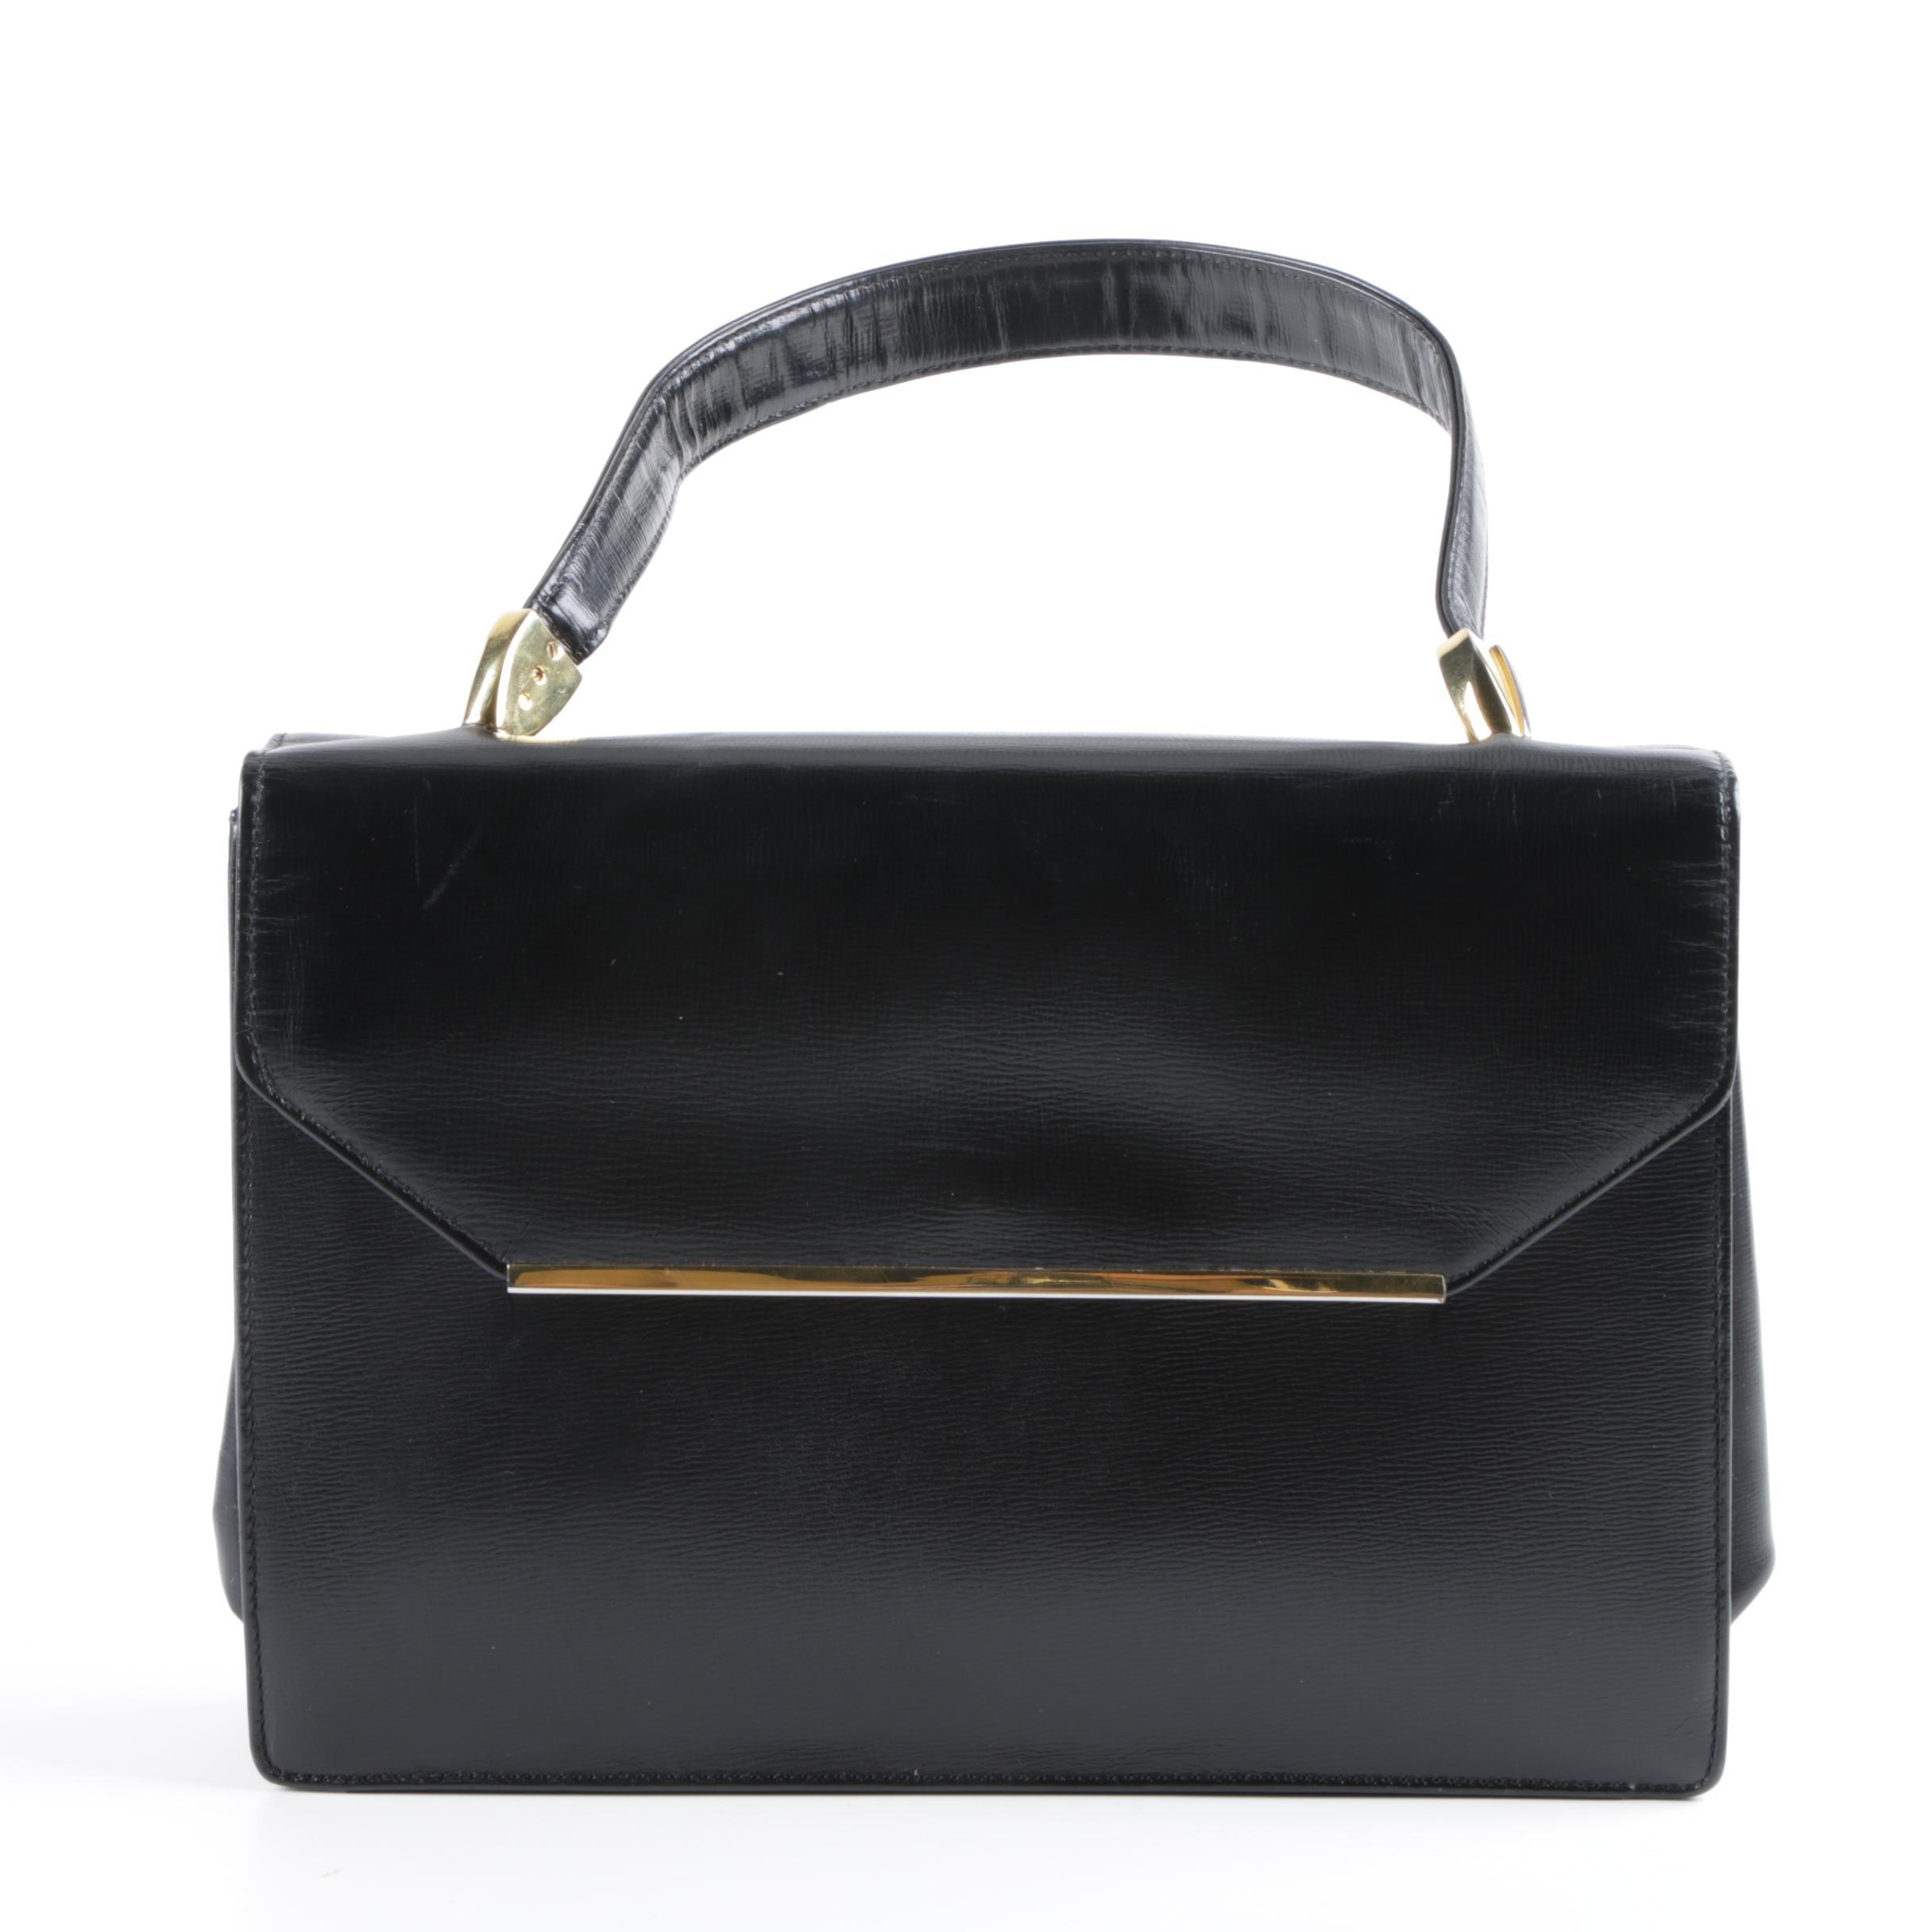 Vintage Koret Black Leather Handbag